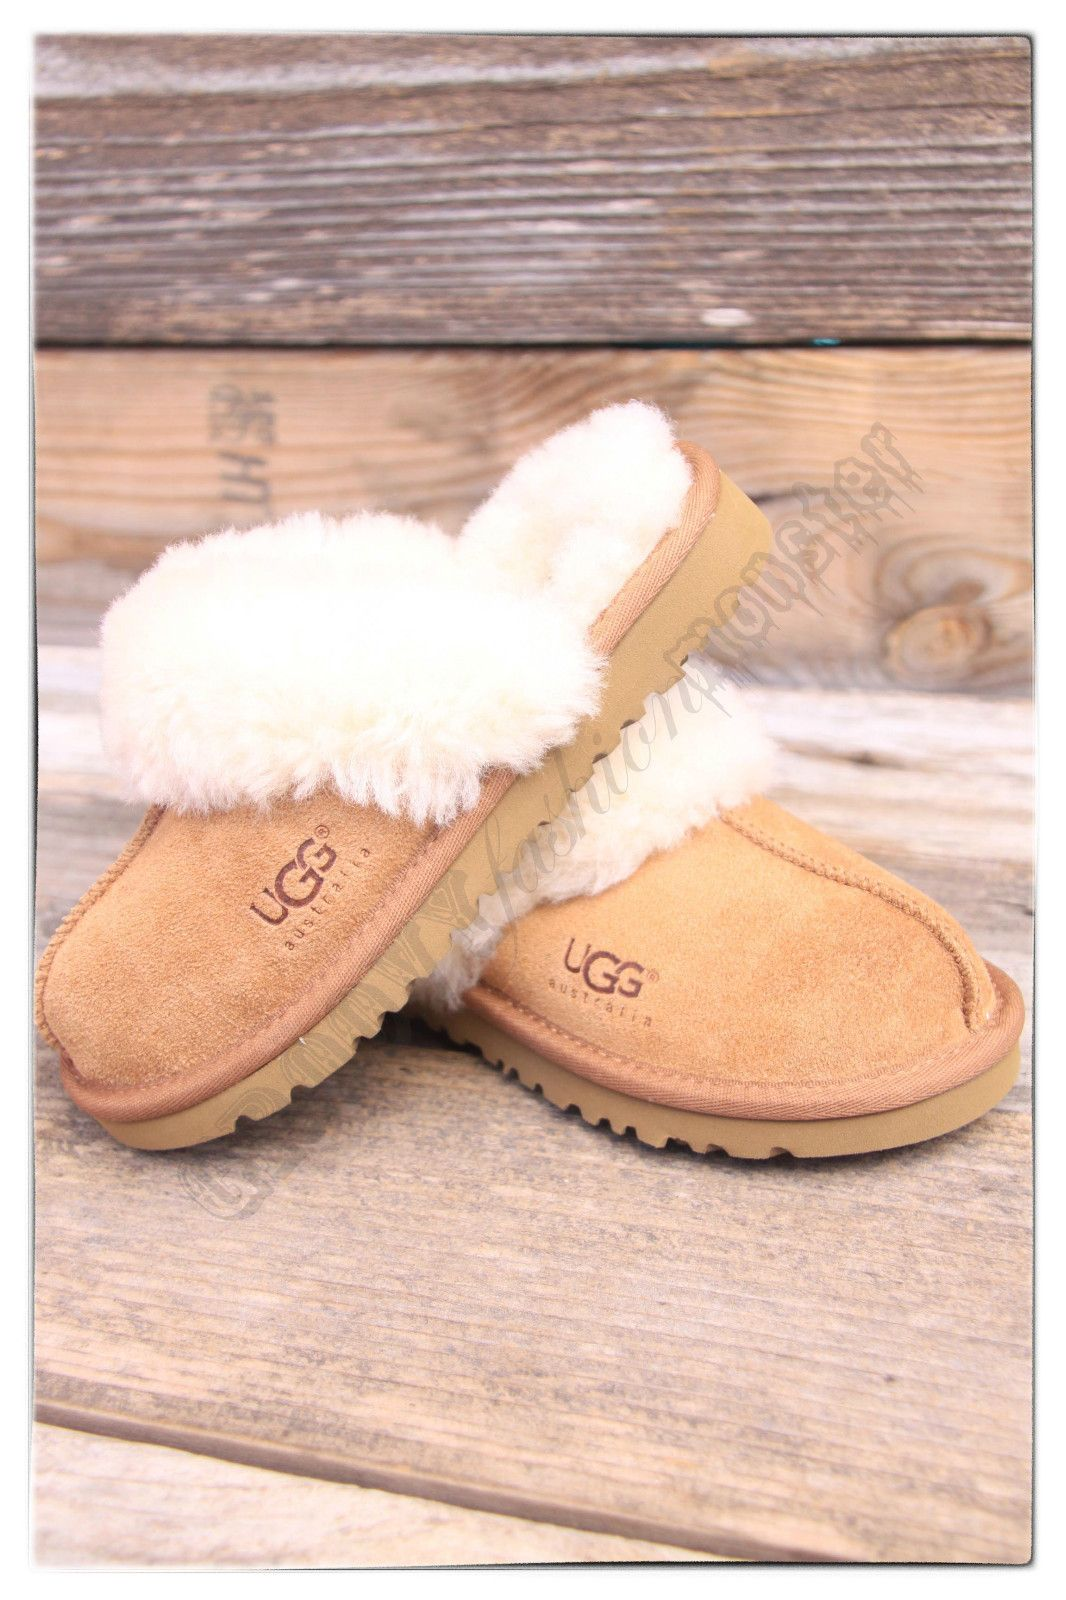 59e96c1f0ea UGG Australia Kids Cozy Chestnut Slide On Sheepskin Slippers | Shoes ...